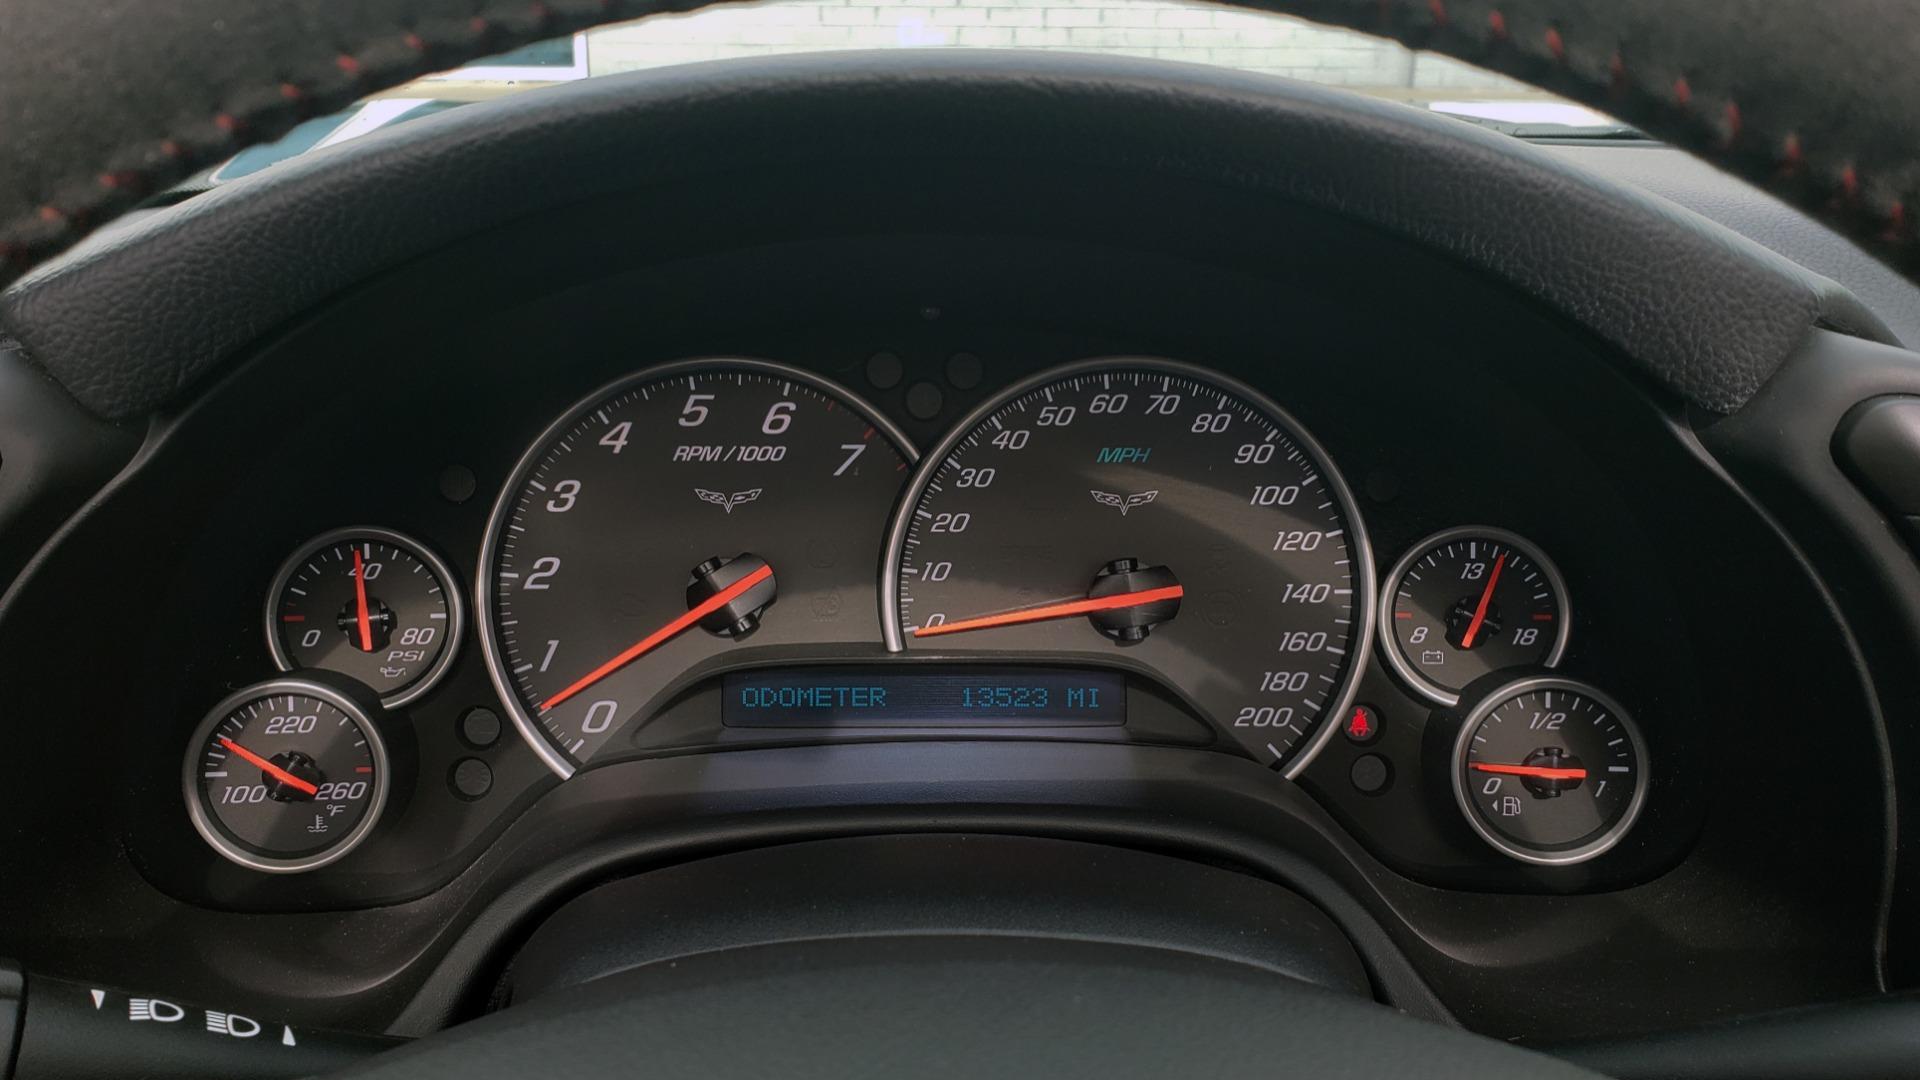 Used 2012 Chevrolet CORVETTE Z16 GRAND SPORT 3LT CONVERTIBLE / 6-SPD AUTO / NAV for sale $38,990 at Formula Imports in Charlotte NC 28227 34